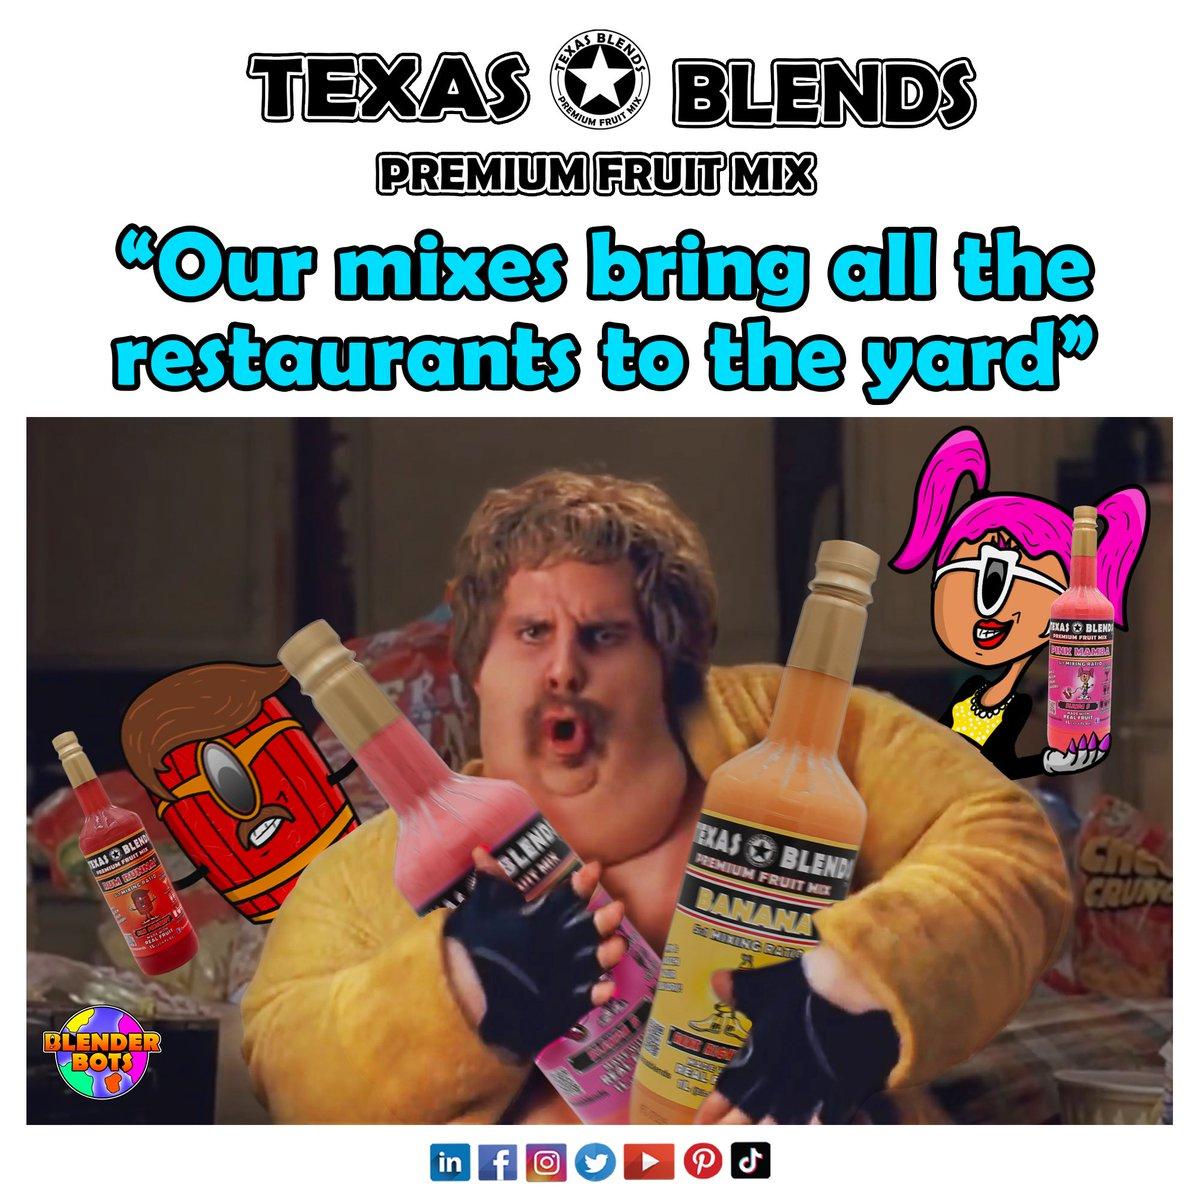 "You Can't Dodge Us,  ""Texas Blends, It's In The Mix""    Call  @texasblends 844-425-3637  #texasblends #ItsInTheMix #realfruit #funny #daiquiri #daiquiristogo #restaurants #restaurantweek #margarita #smoothies #frozendrinks #texas #texasdaiquiris #benstiller #share #dodgeballpic.twitter.com/7lAi1Rtaap"